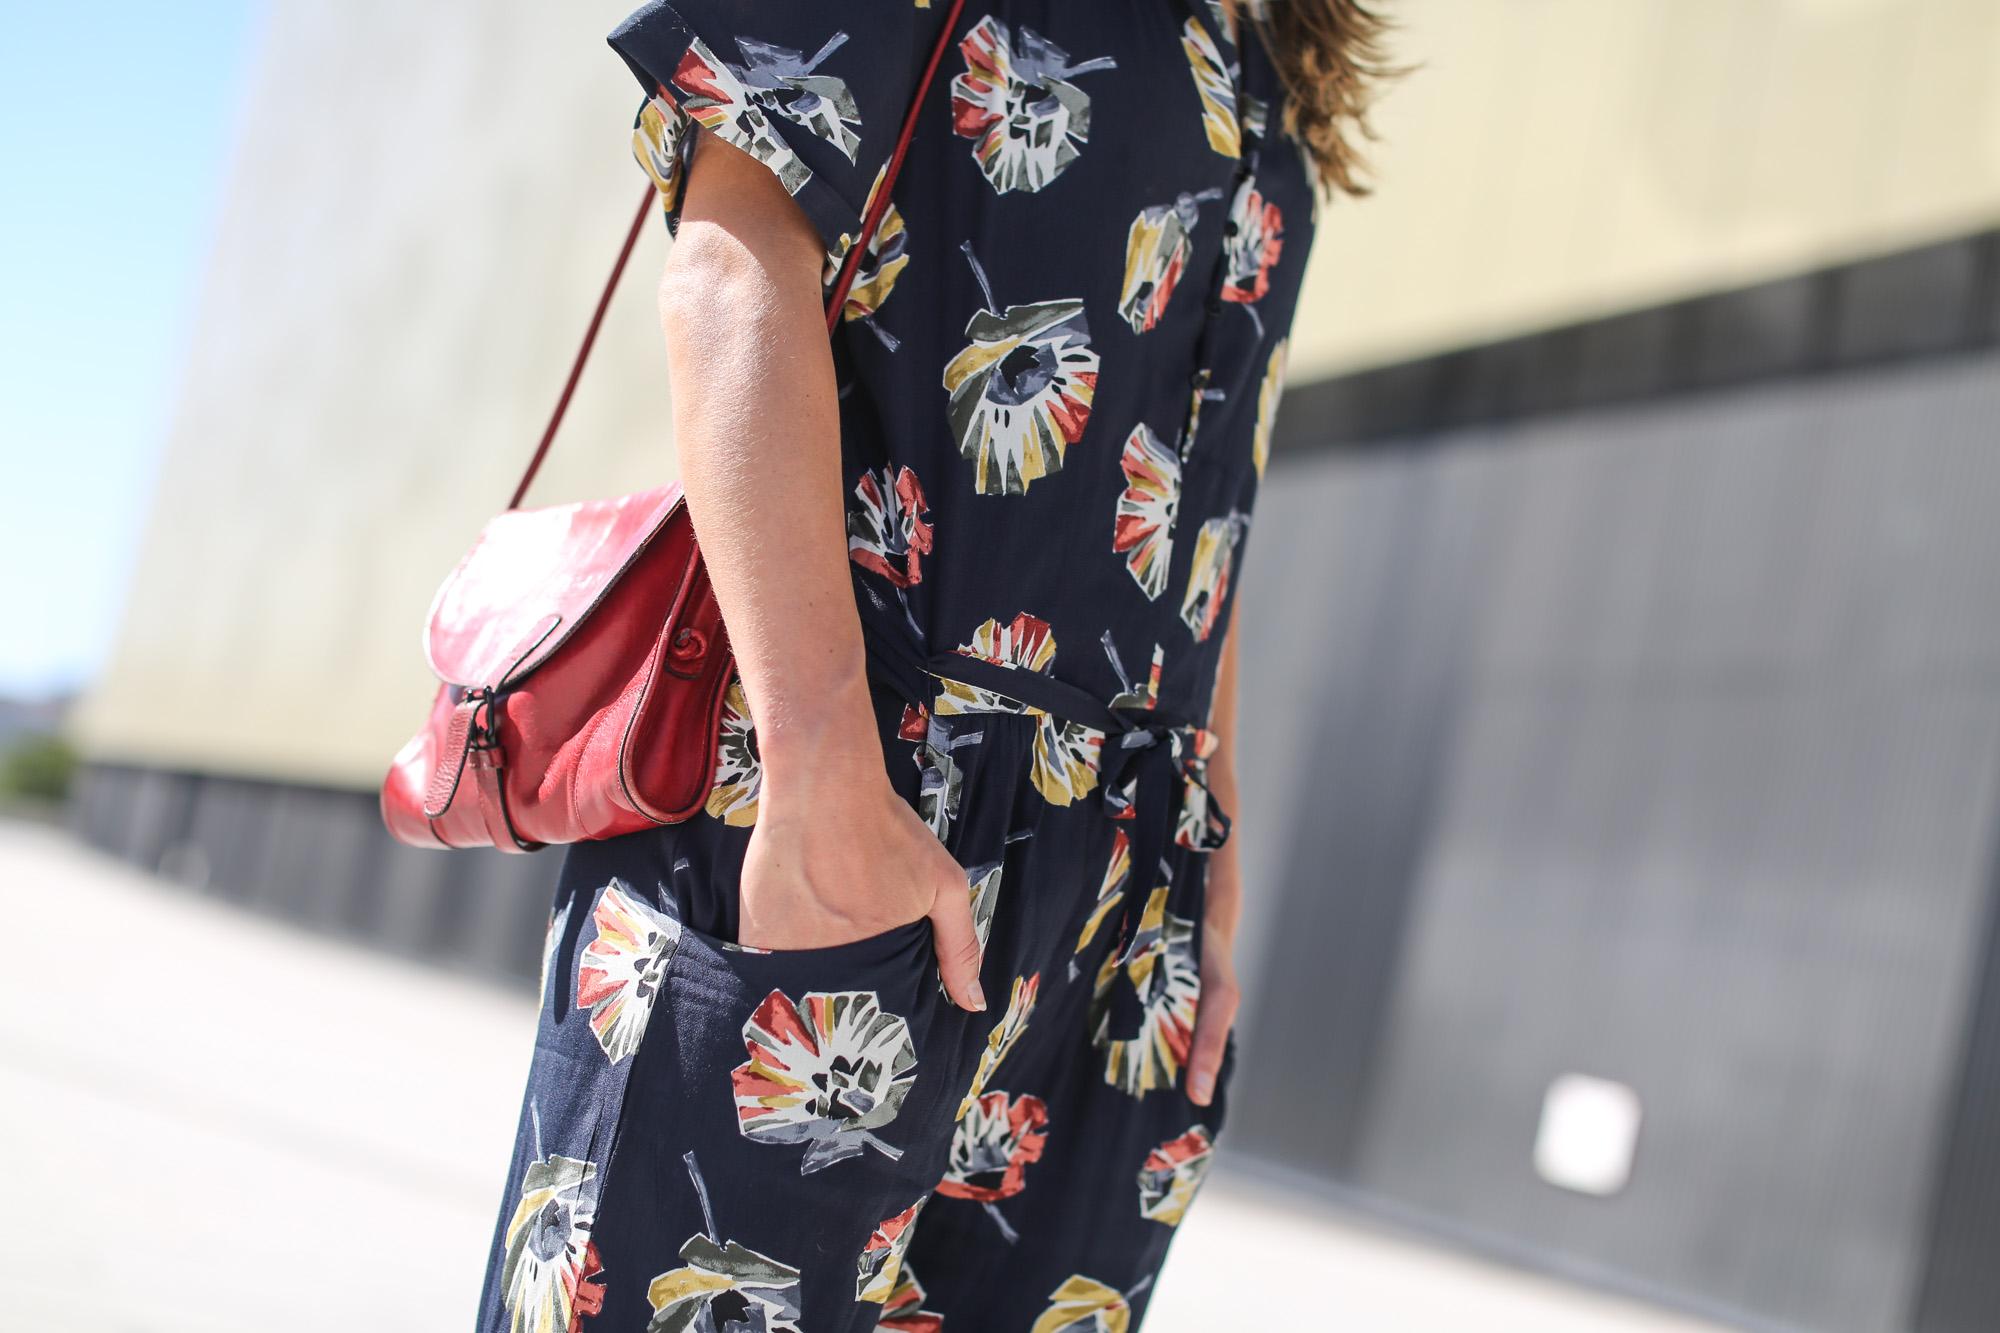 Clochet-streetstyle-vagabond-sliders-zara-flowers-jumpsuit-2